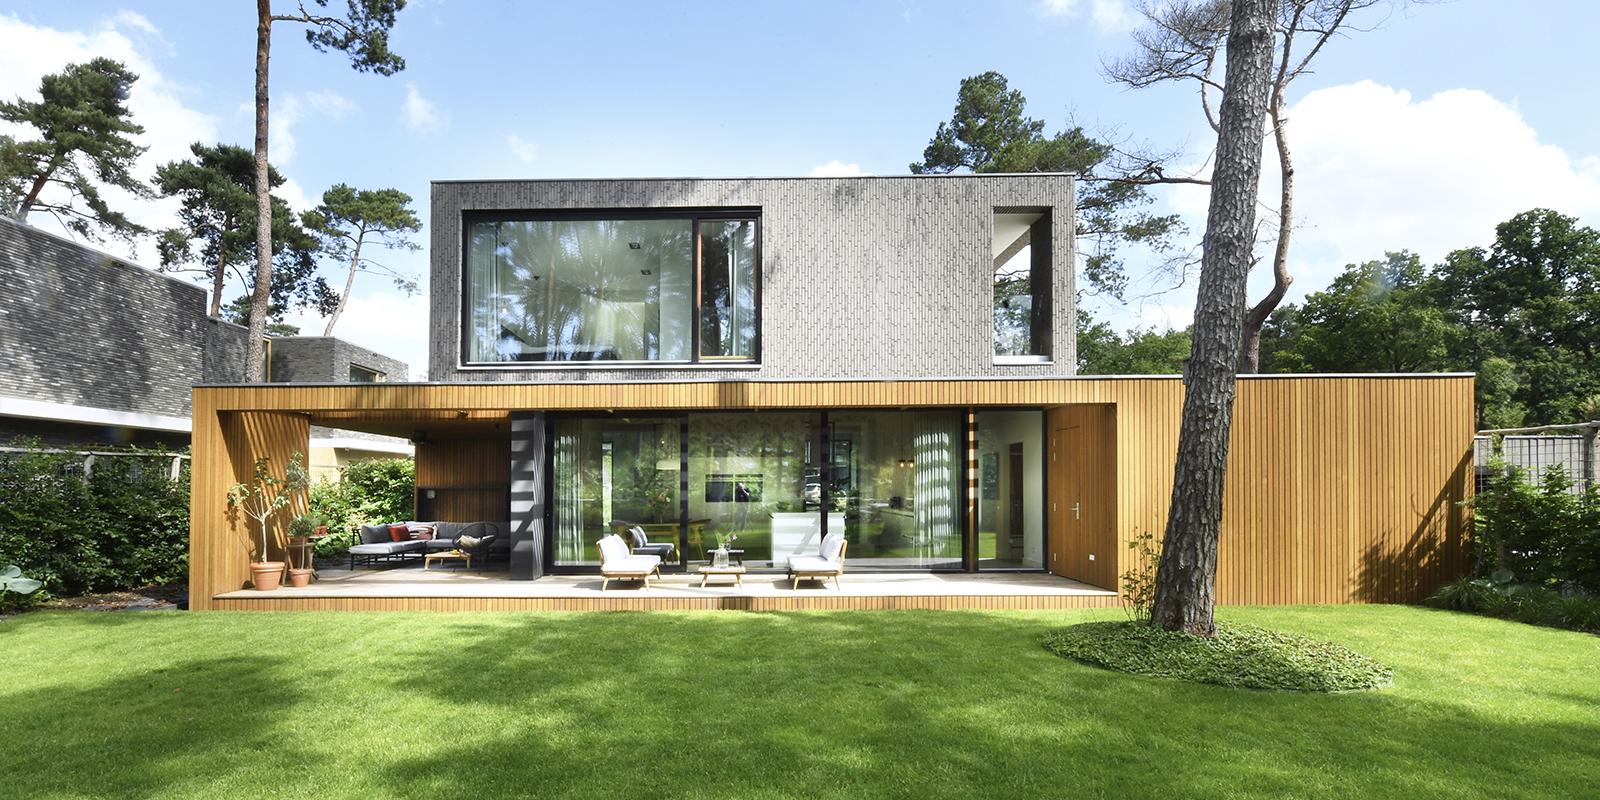 Moderne villa, Kraal Architecten, the art of living